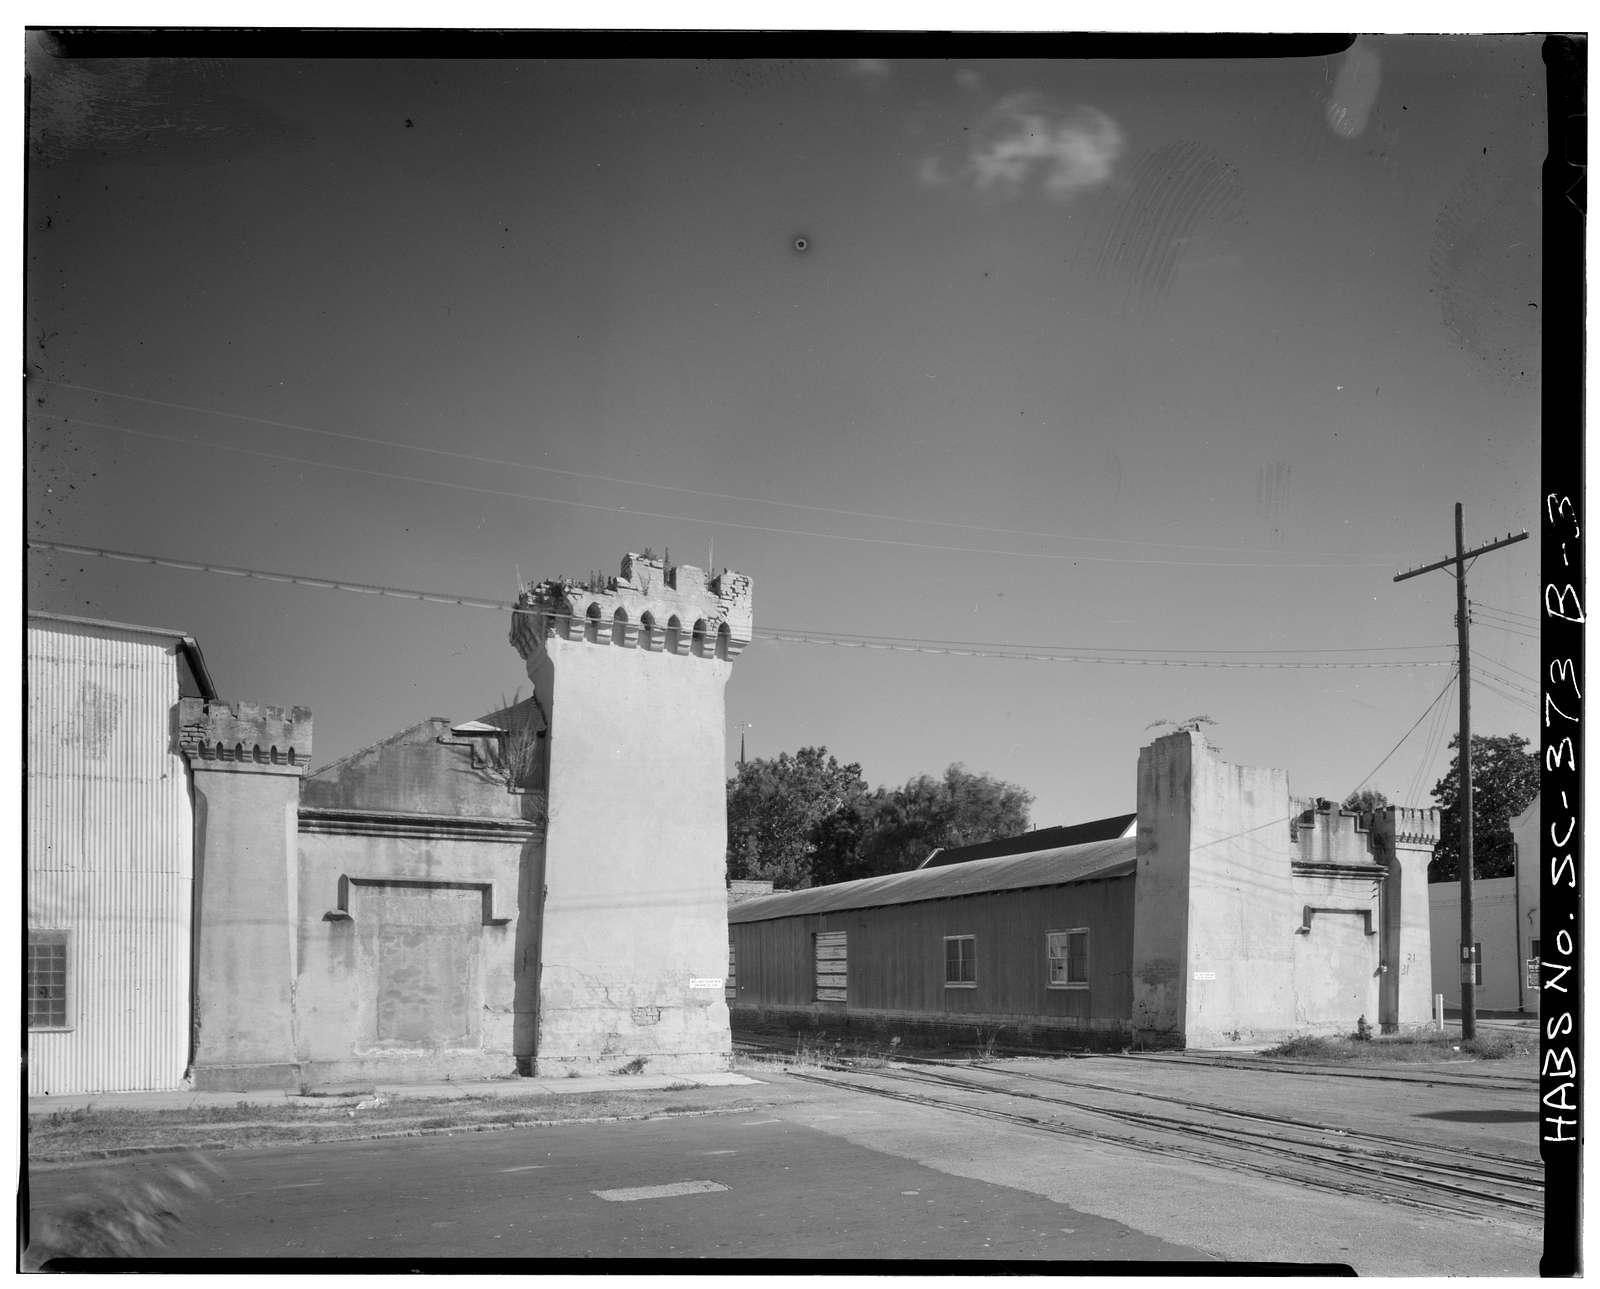 South Carolina Railroad-Southern Railway Company, Camden Depot, Anne Street, Charleston, Charleston County, SC